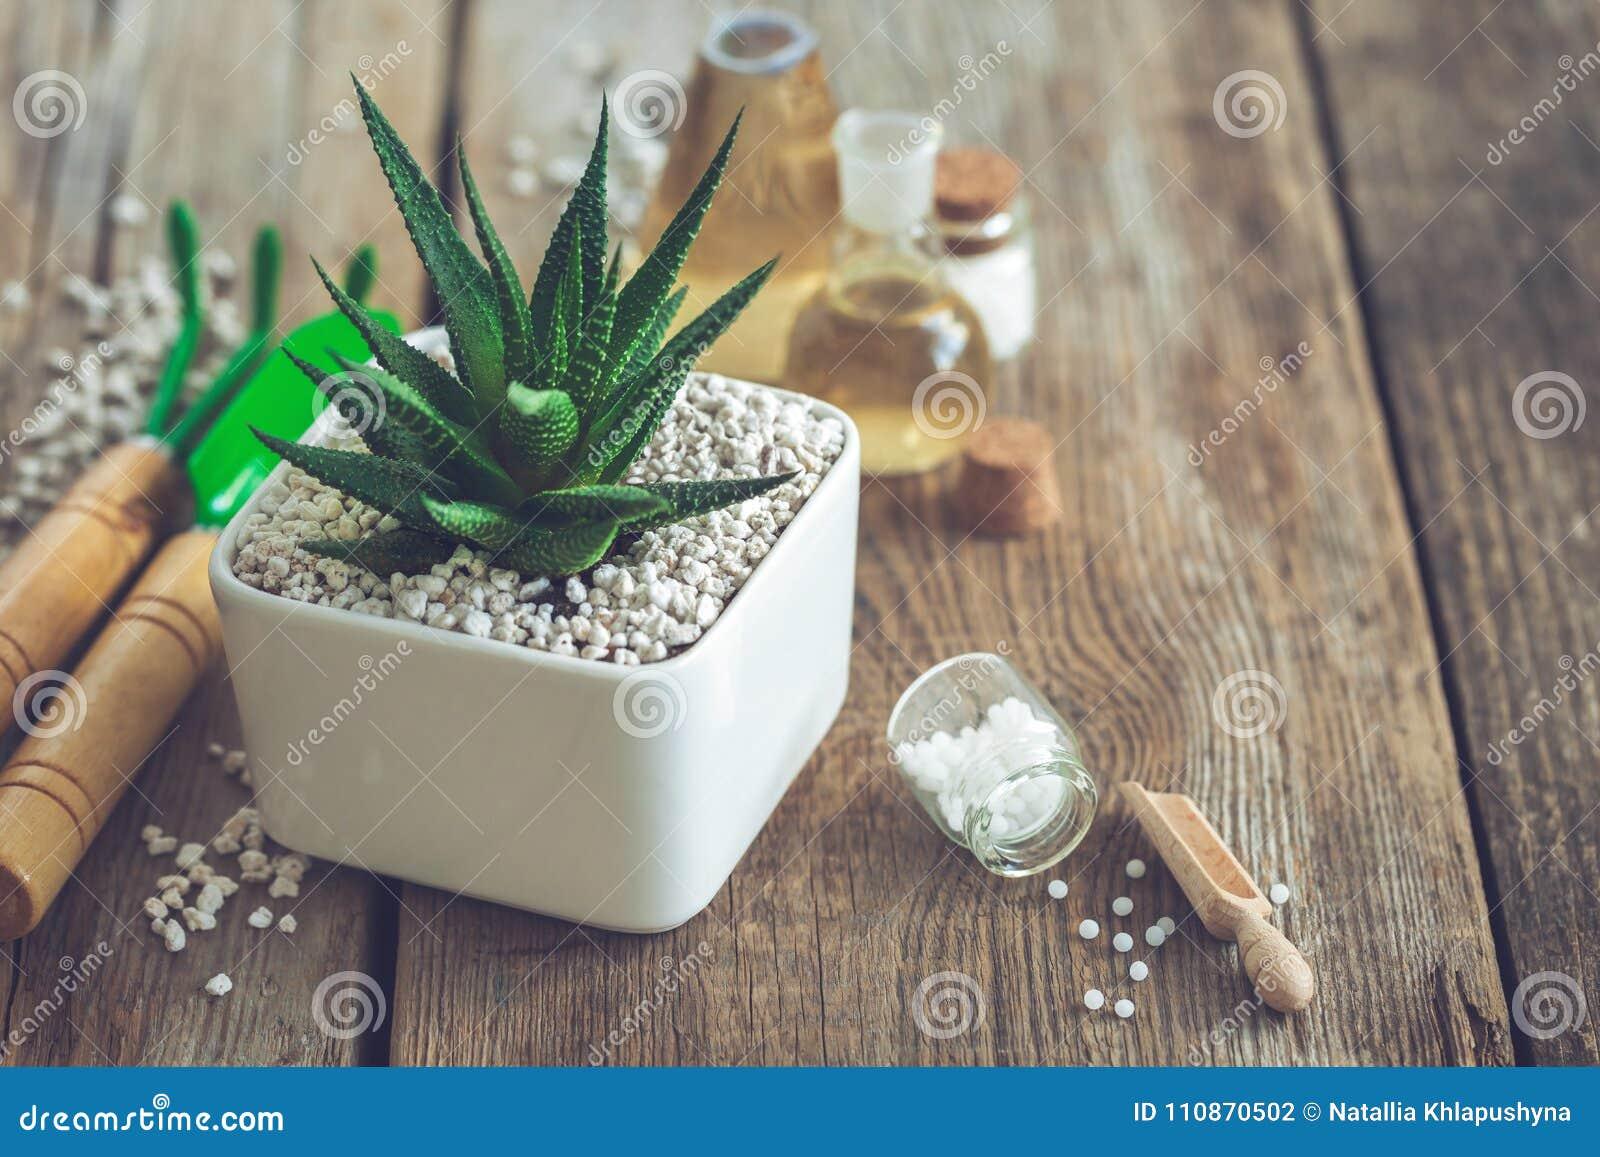 Haworthia succulent στο δοχείο λουλουδιών, τα μίνι εργαλεία κήπων και τις ομοιοπαθητικές θεραπείες για τις εγκαταστάσεις